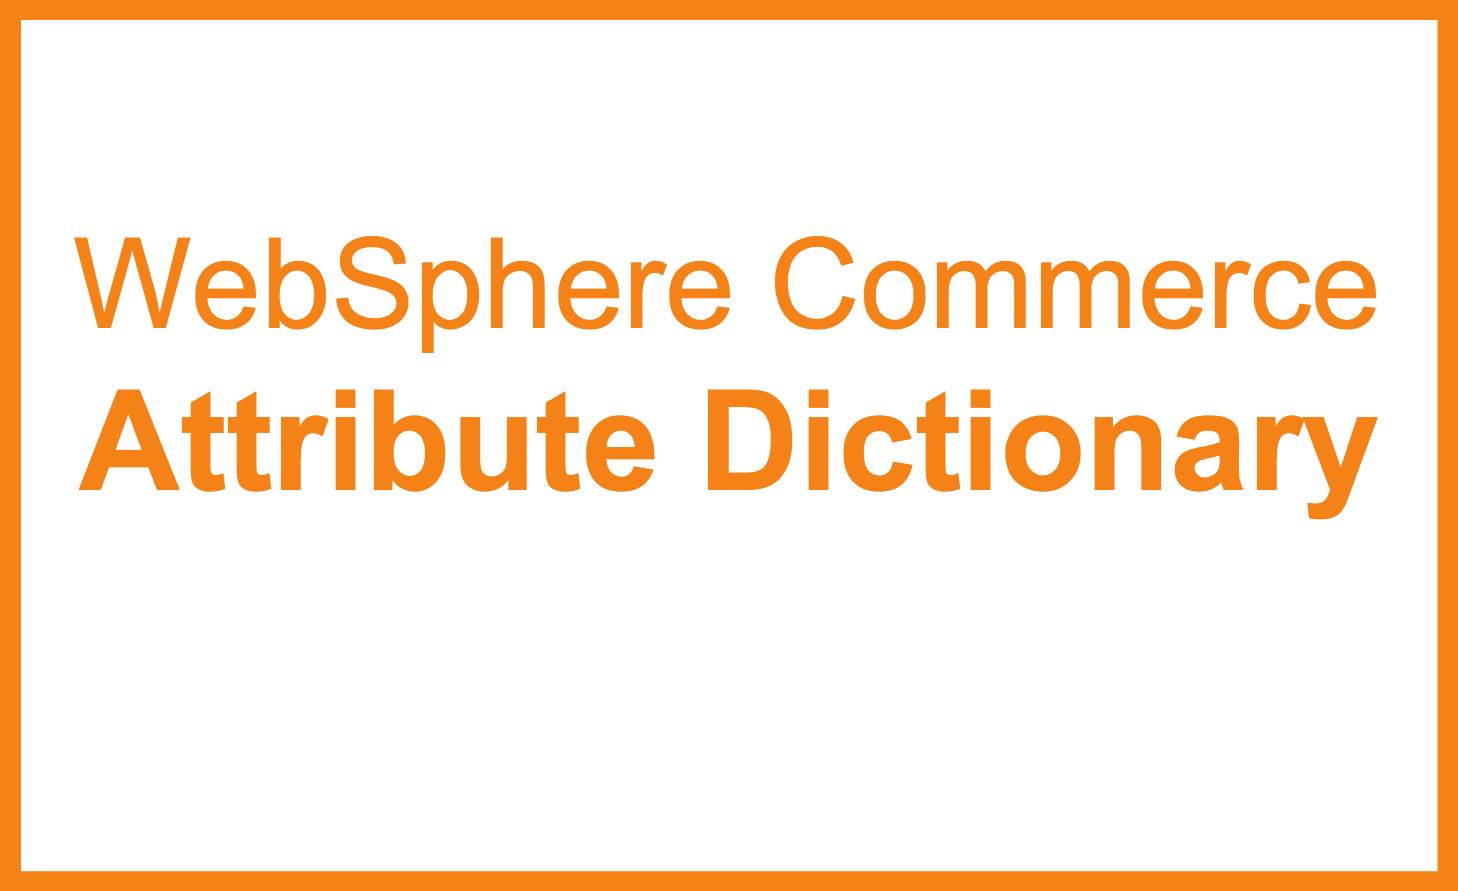 attribute_dictionary_LI